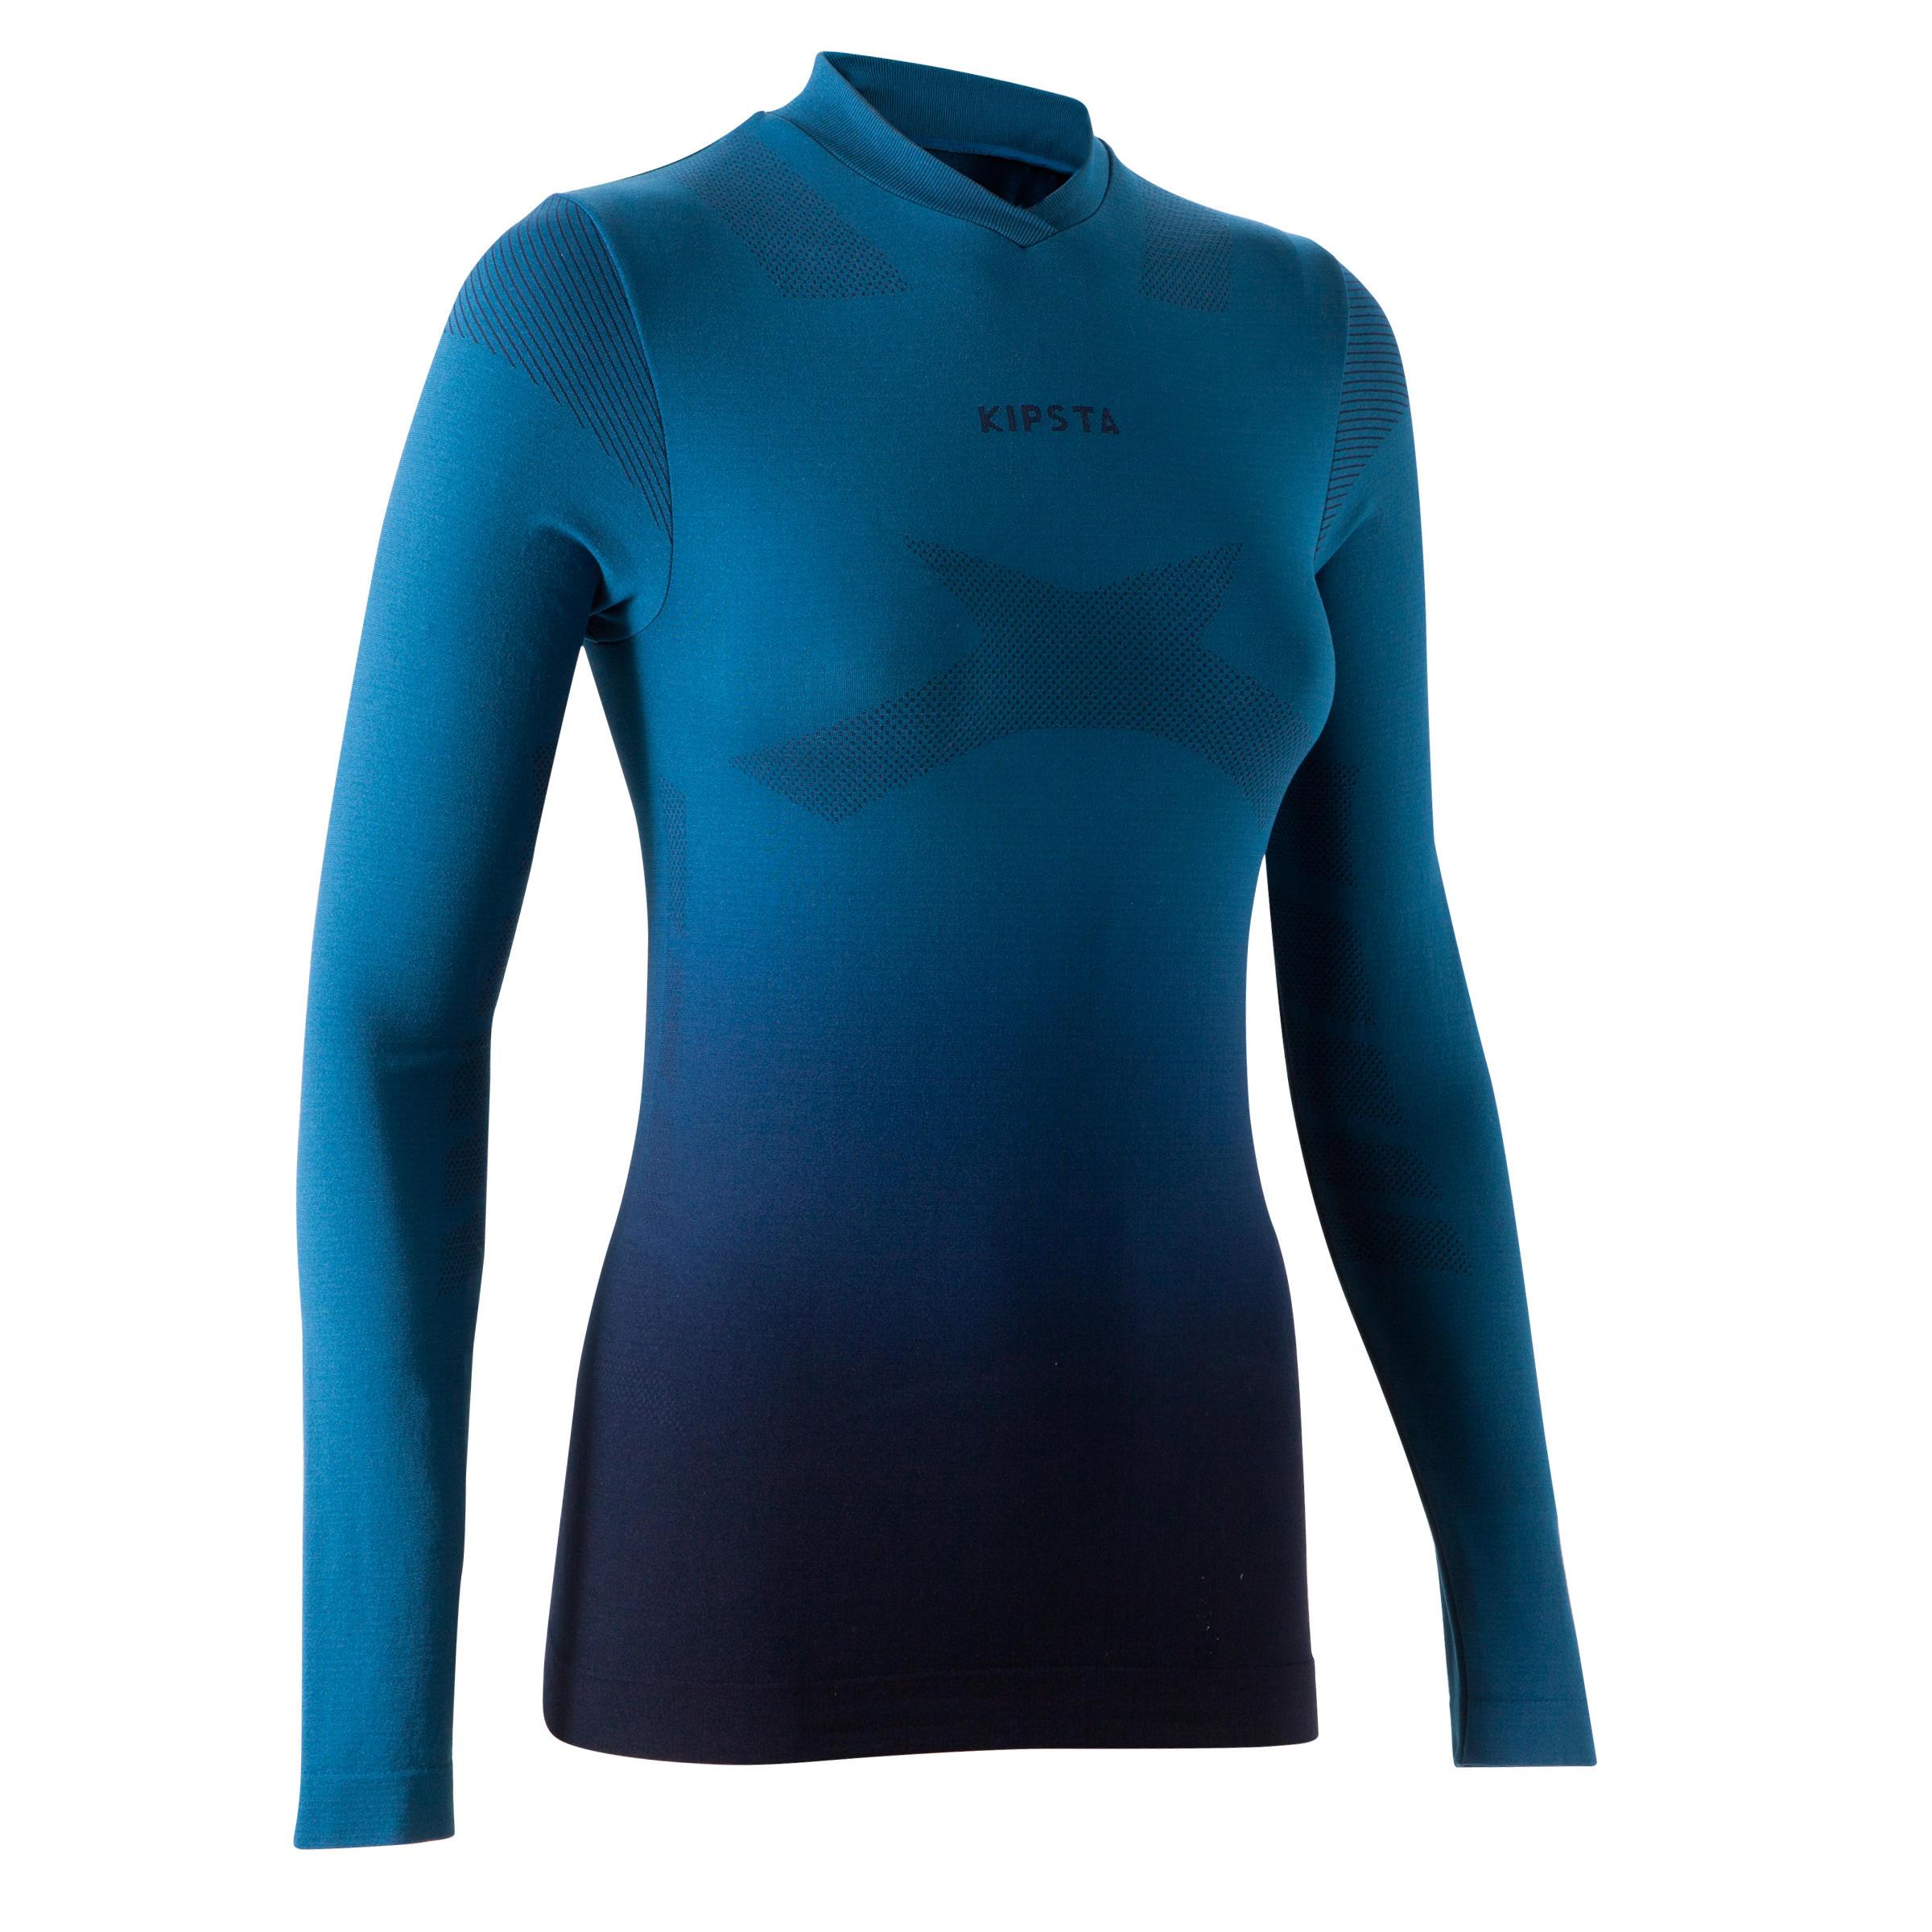 Kipsta Thermoshirt dames Keepdry 500 met lange mouwen blauw